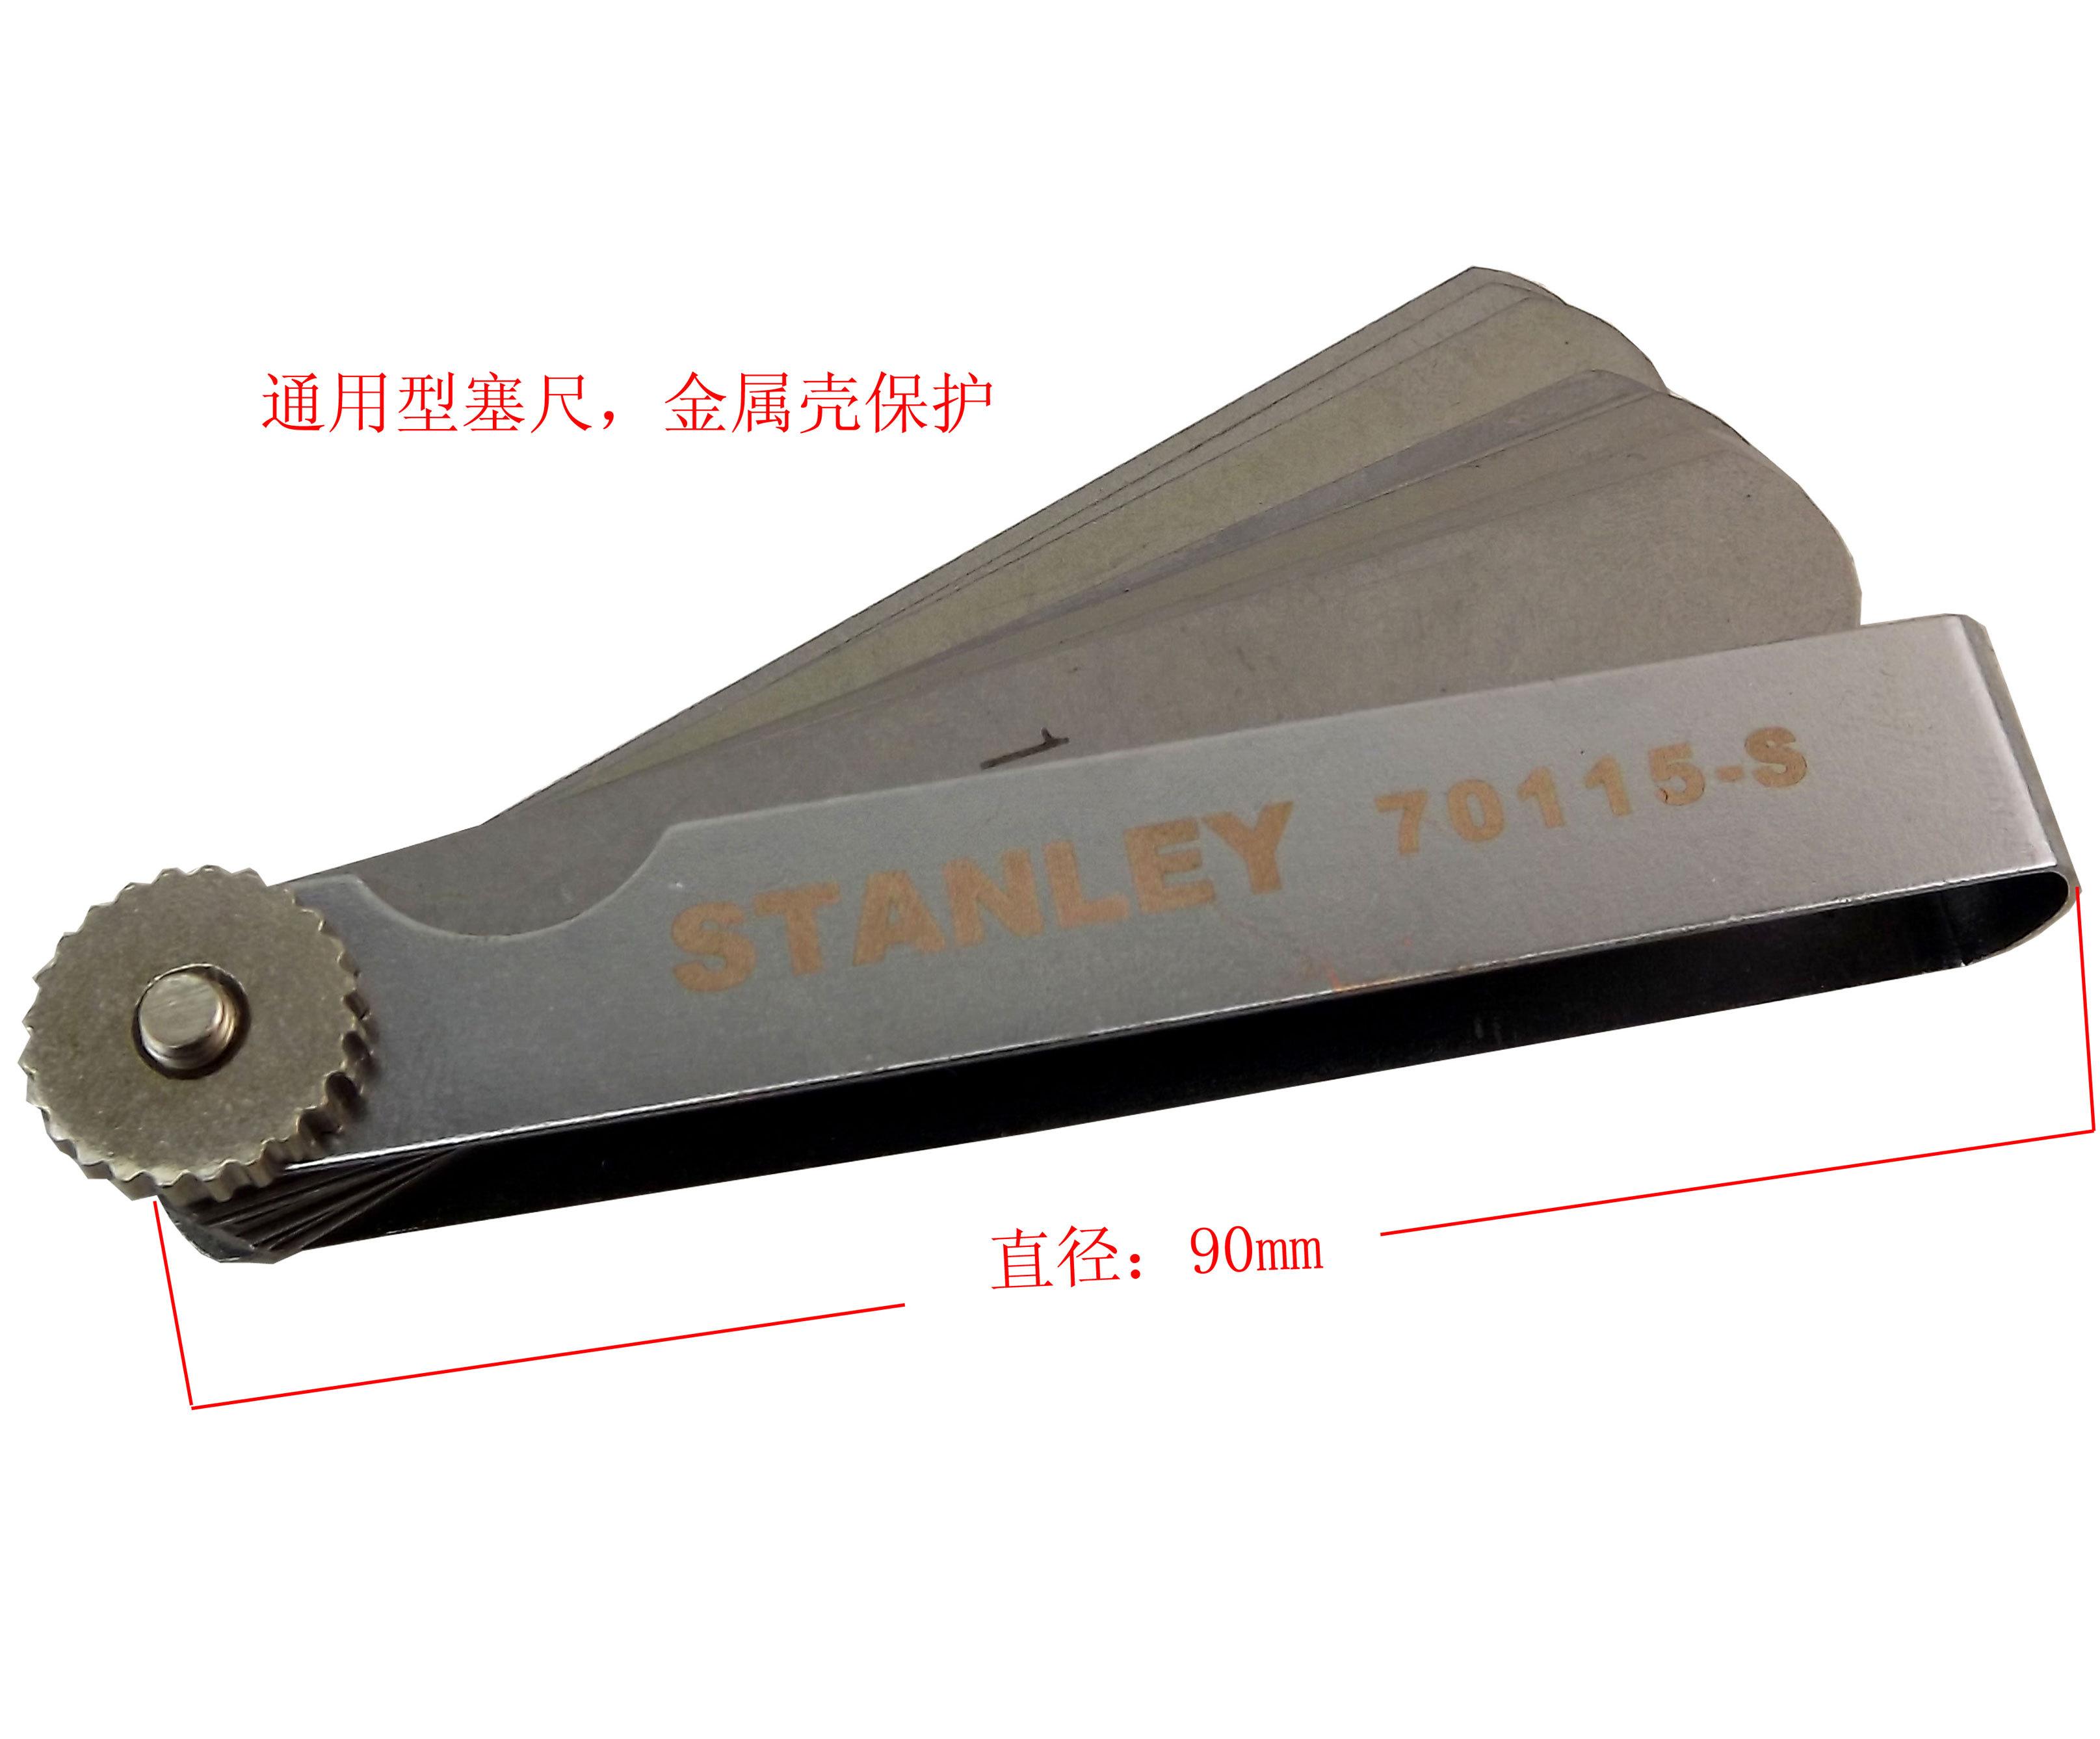 Щуп измерительный Stanley 25 0.04-1.00MM 70115-S vintage rhinestone water drop geometric necklace jewelry for women